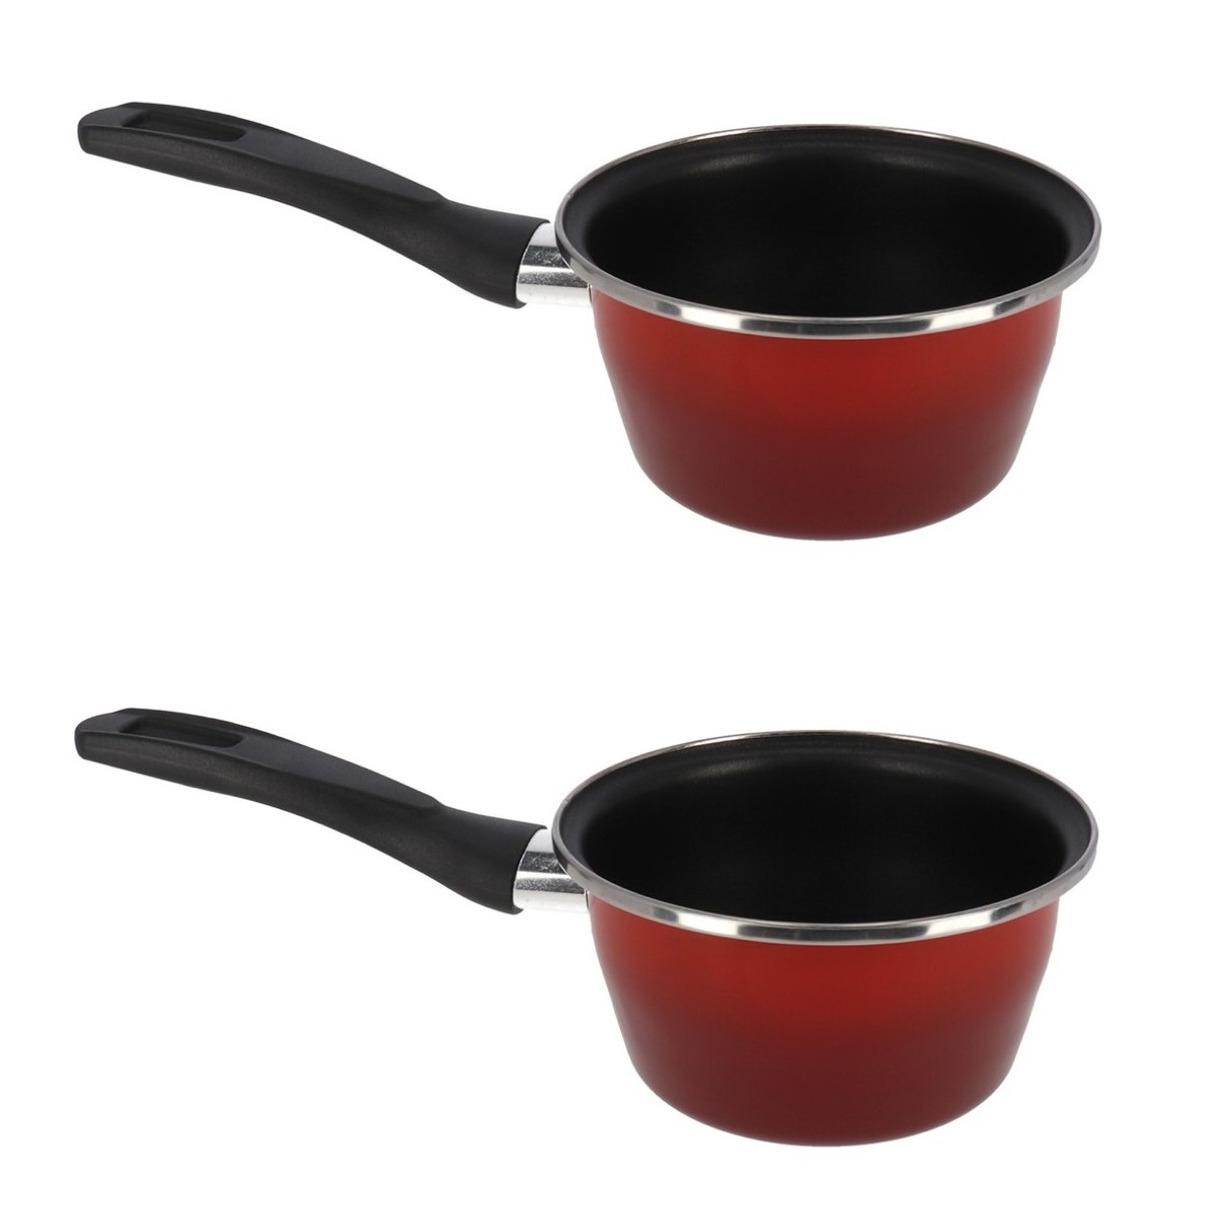 Set van 2x stuks steelpan sauspan rood anti aanbaklaag 14 cm